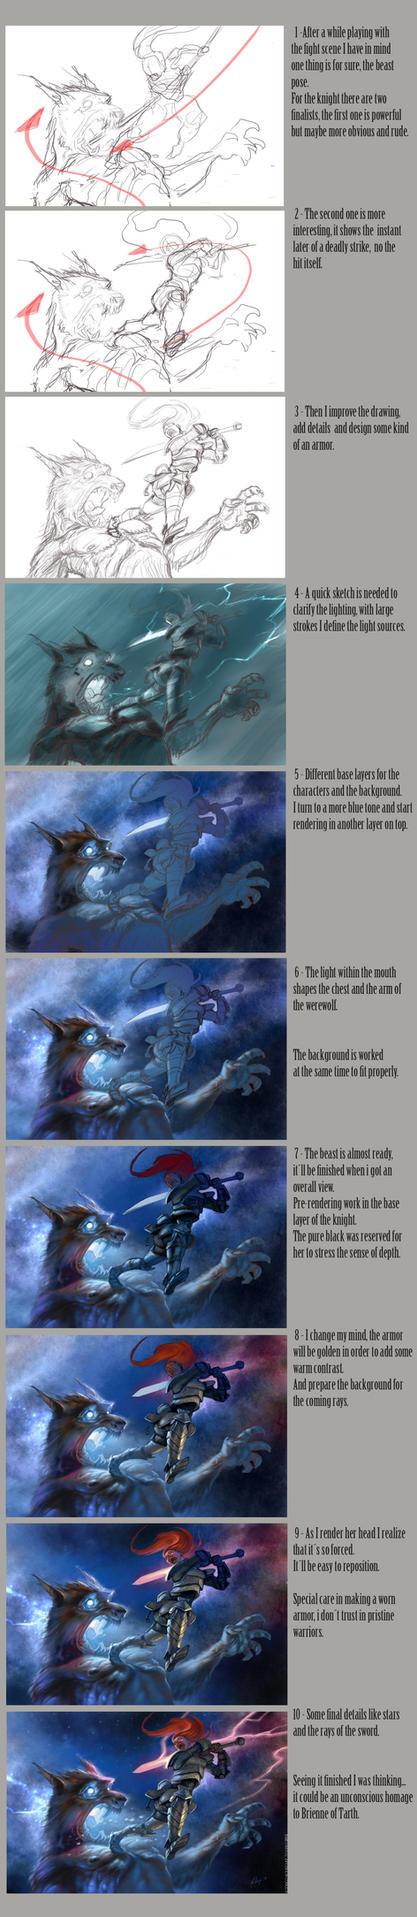 Epic-process by Callibanda